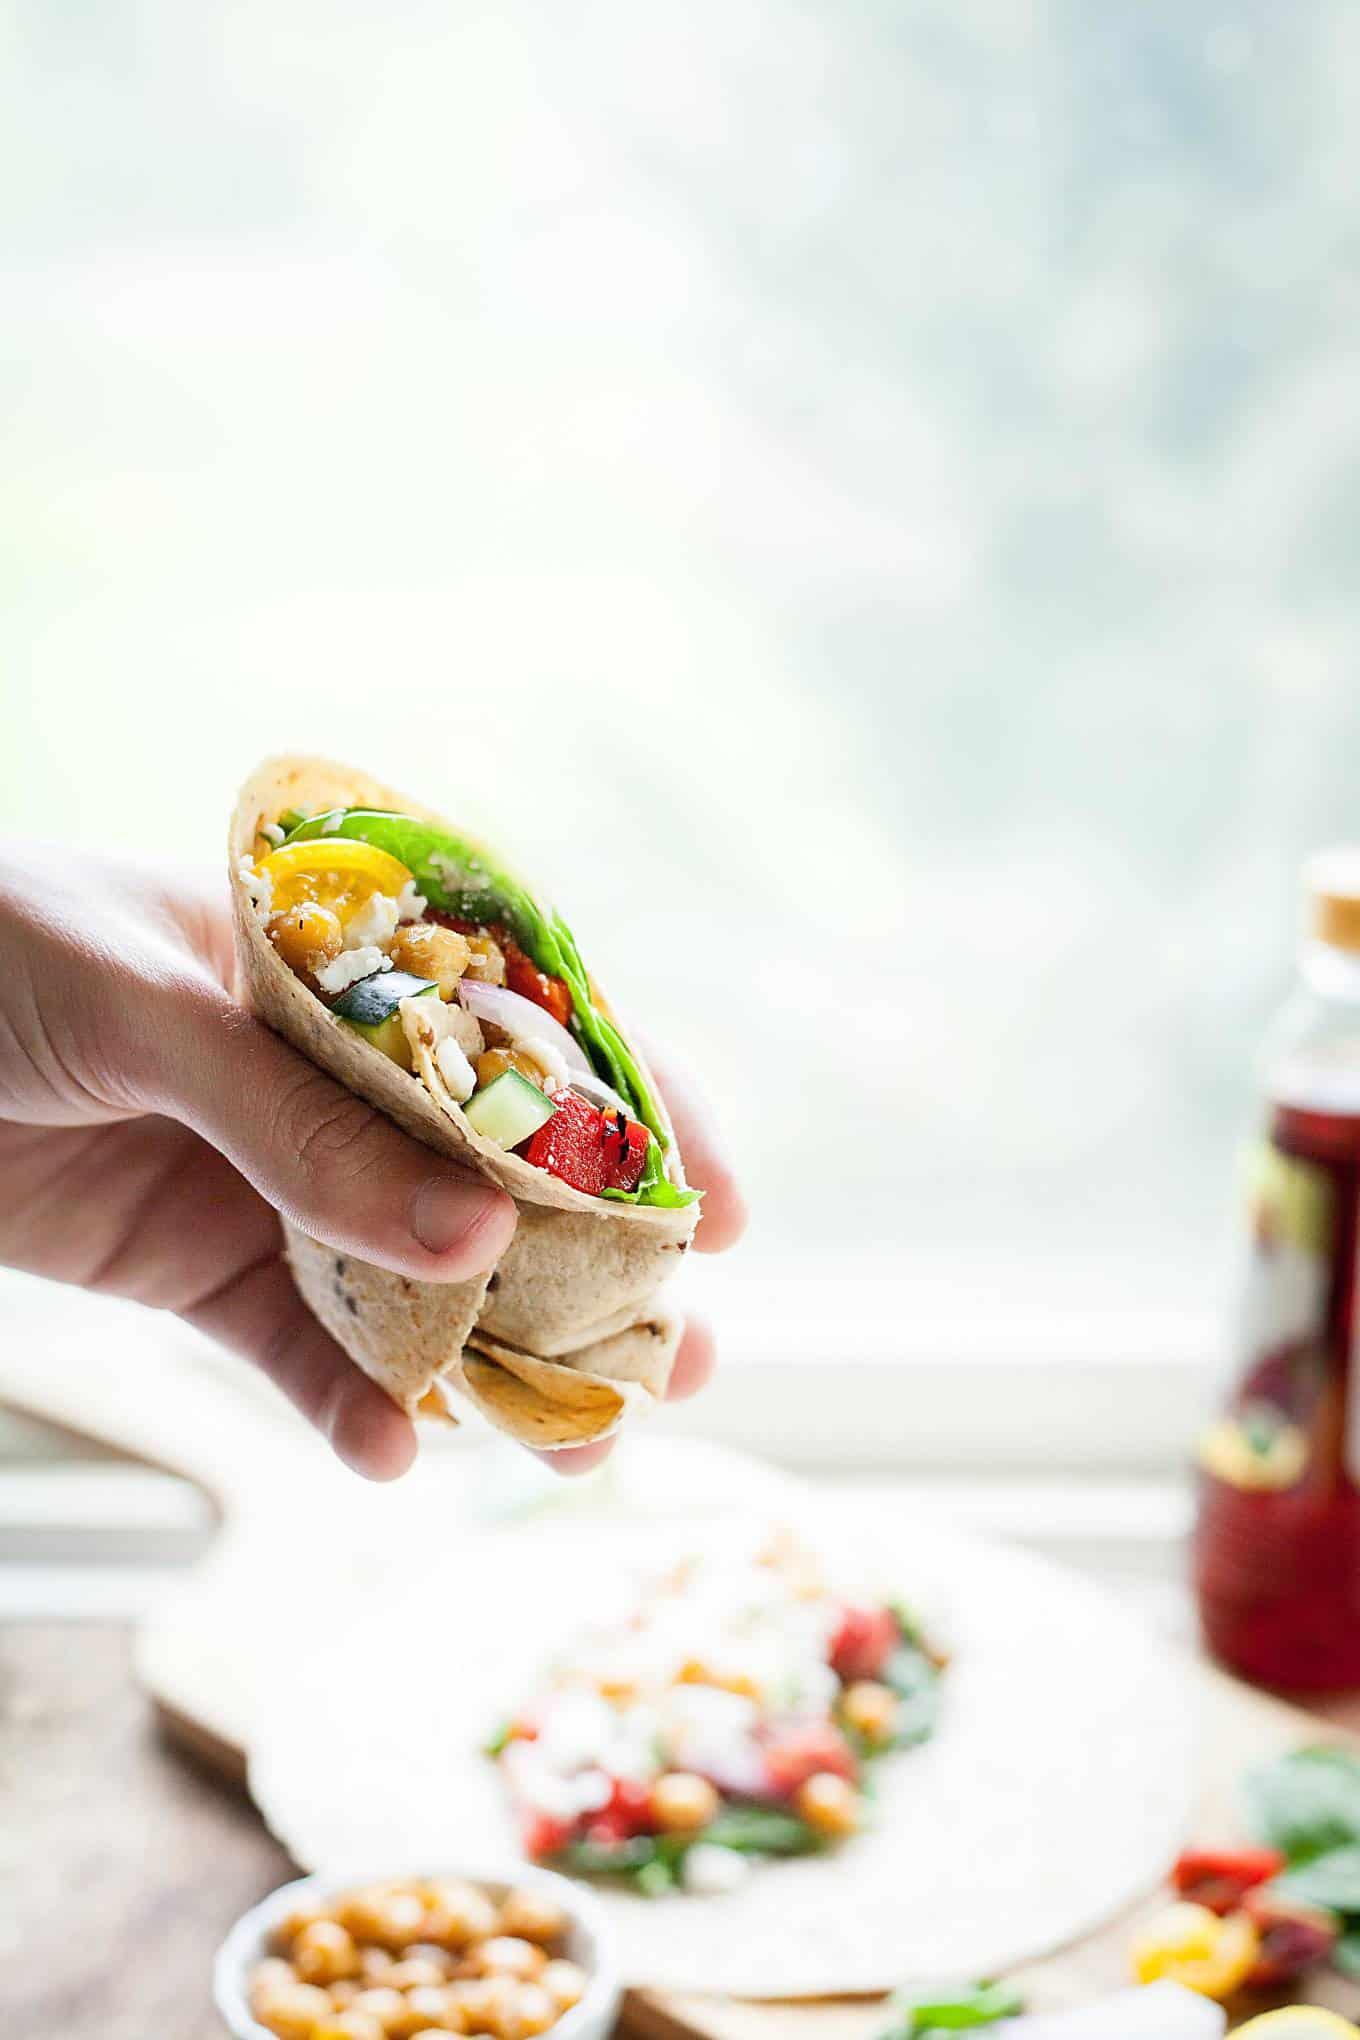 a hand picking up half a greek chickpea sandwich